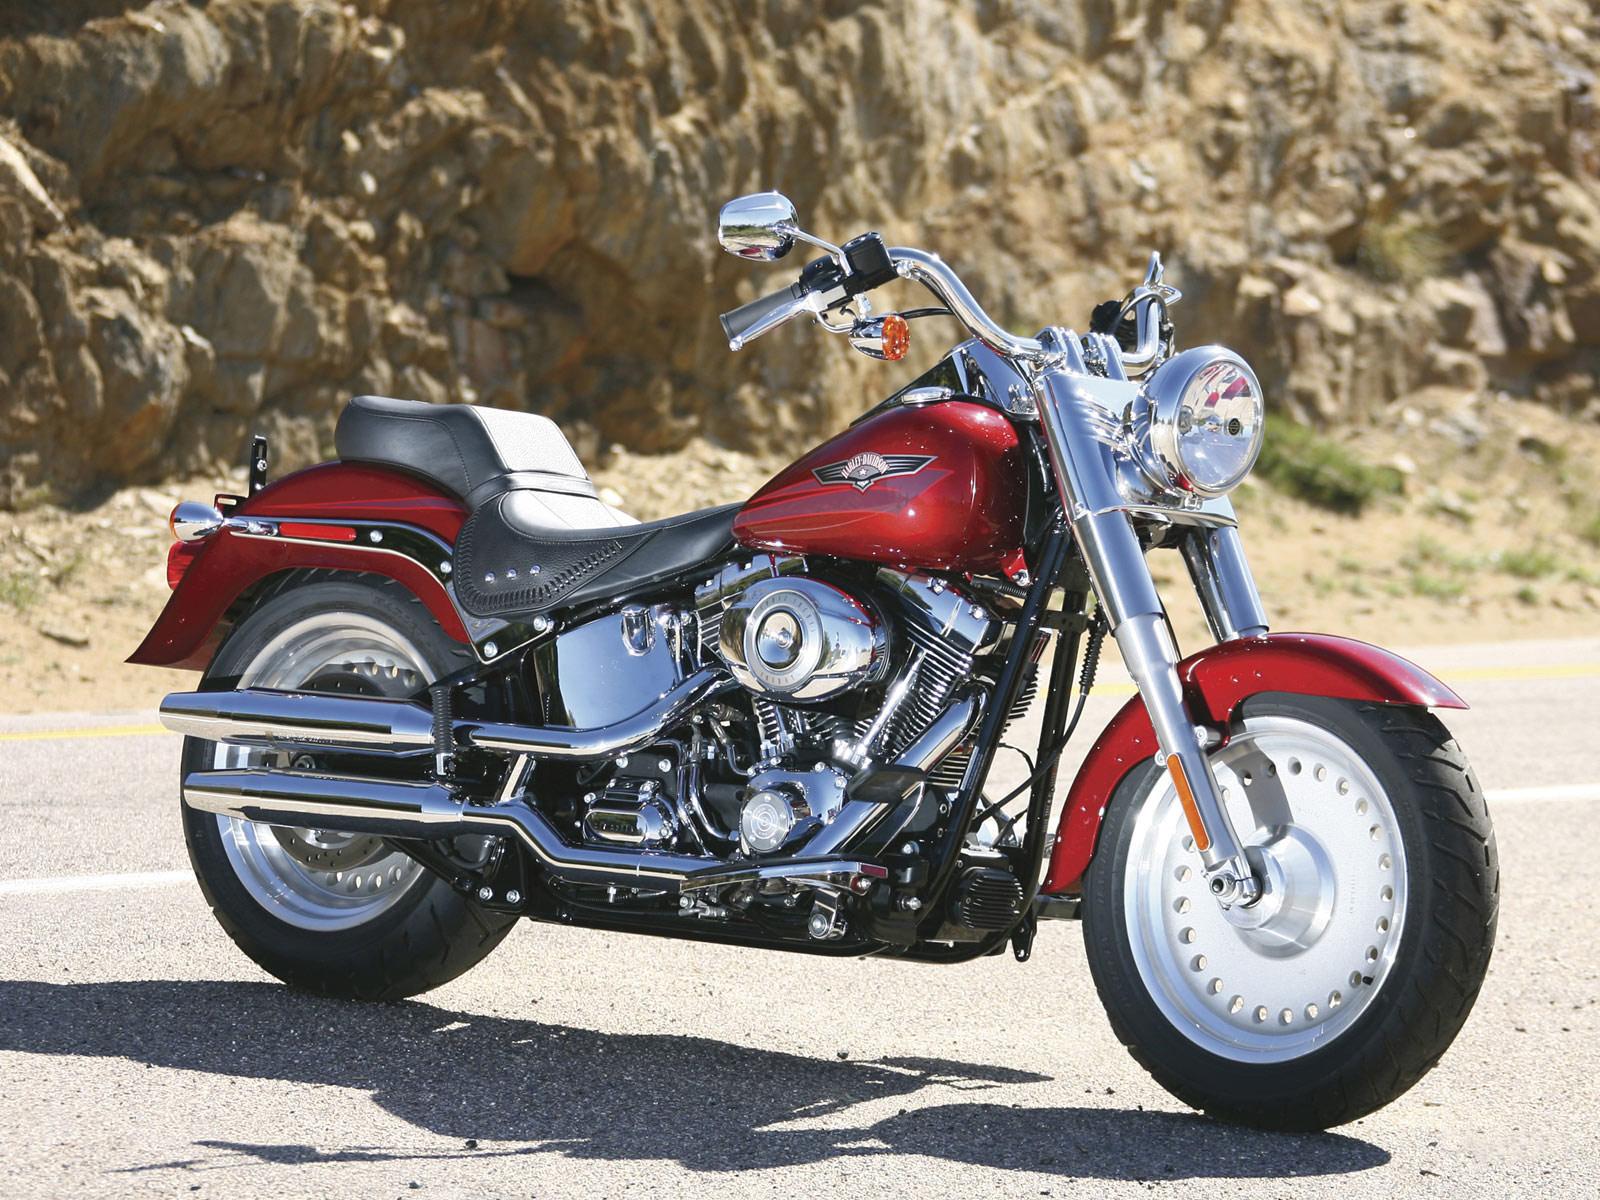 Harley Davidson: FLSTF Softail Fat Boy 2008 Harley-Davidson Pictures